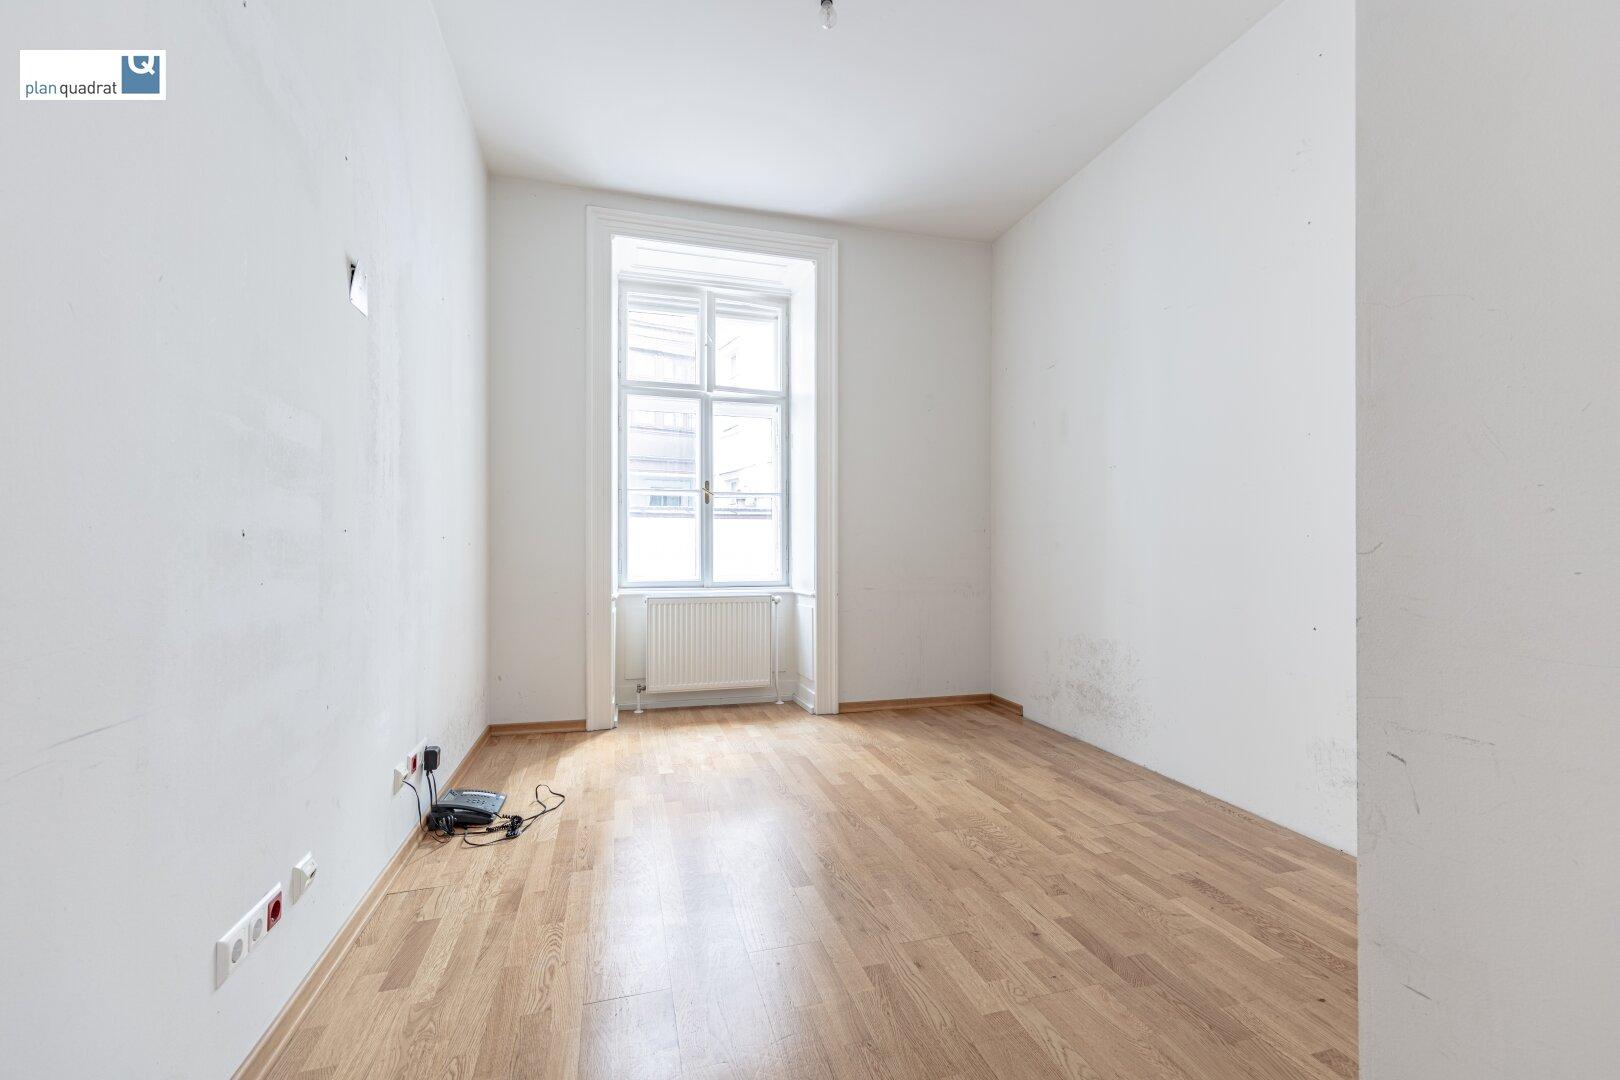 Büro 5 (ca. 11,60 m²)